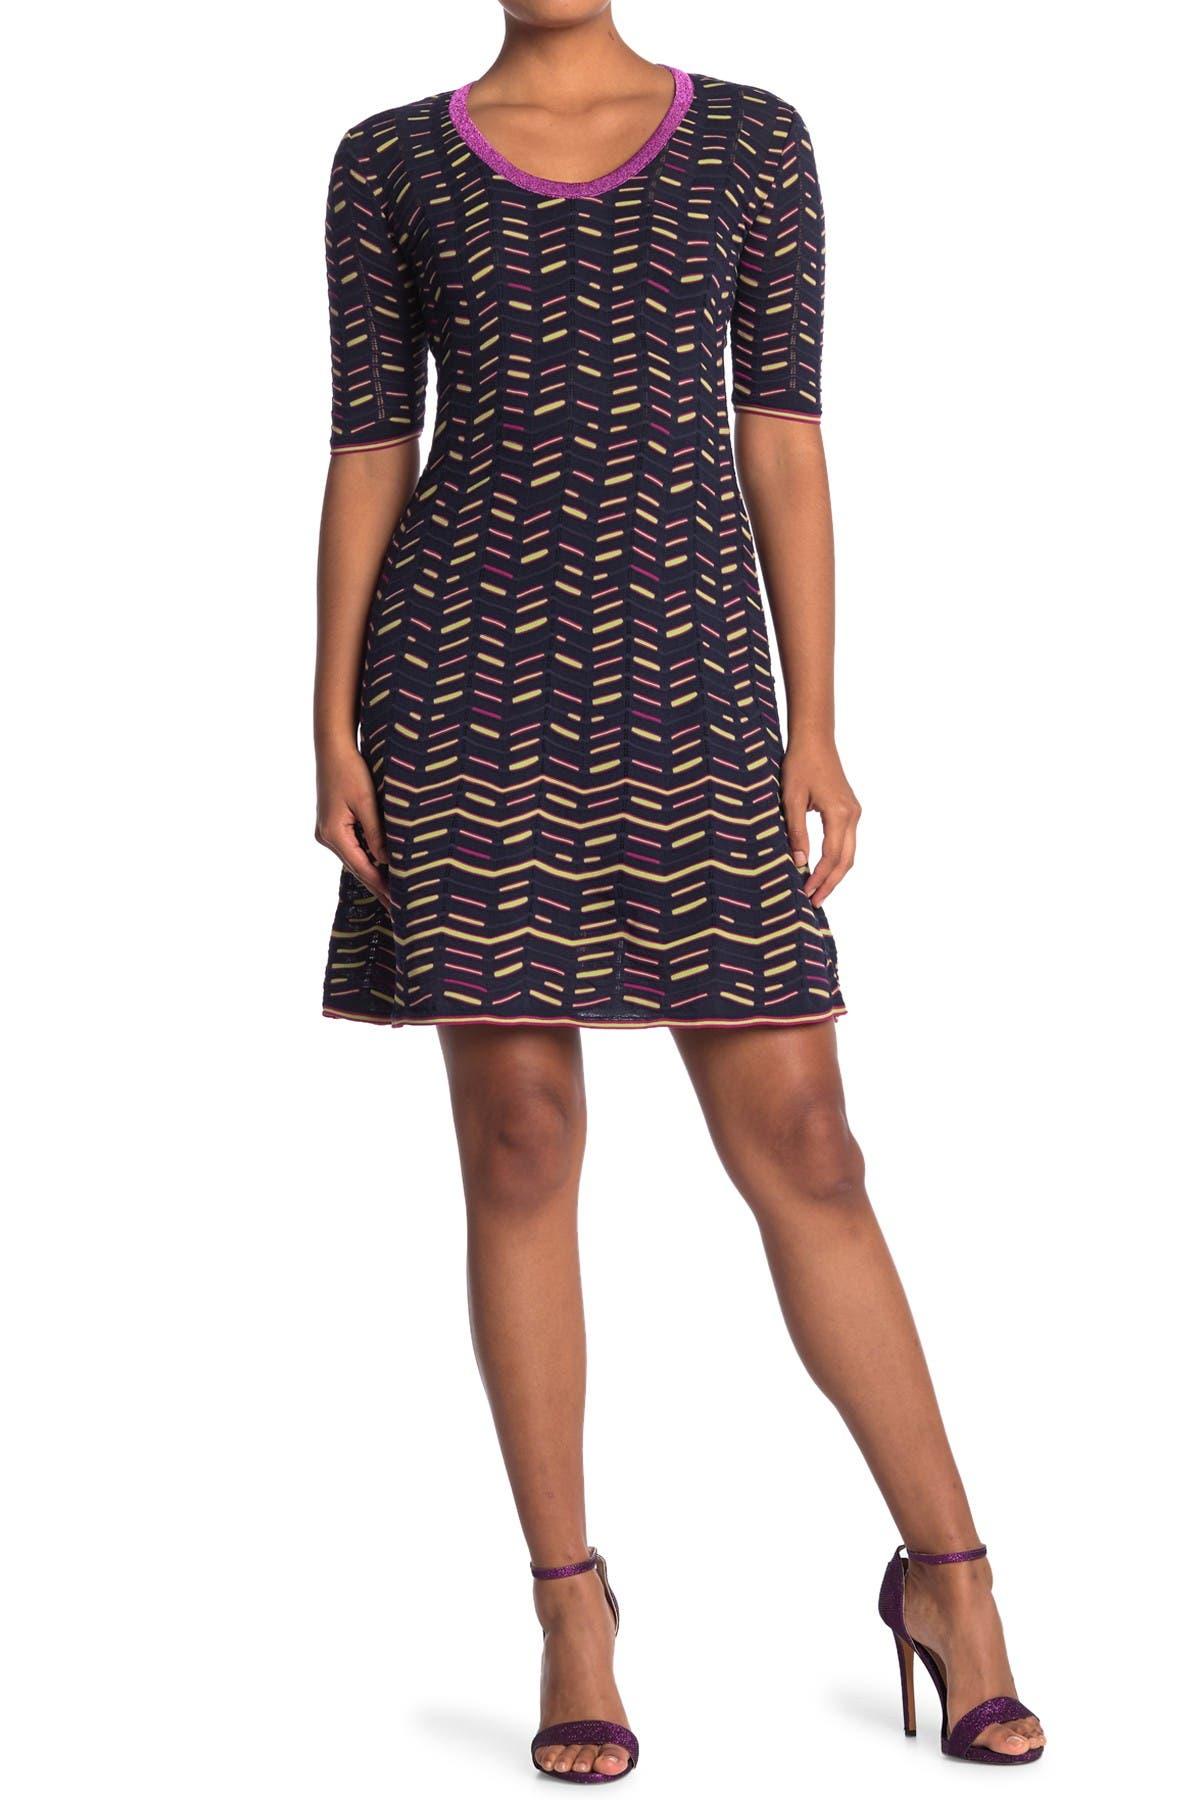 Image of M Missoni Patterned Scoop Neck Dress